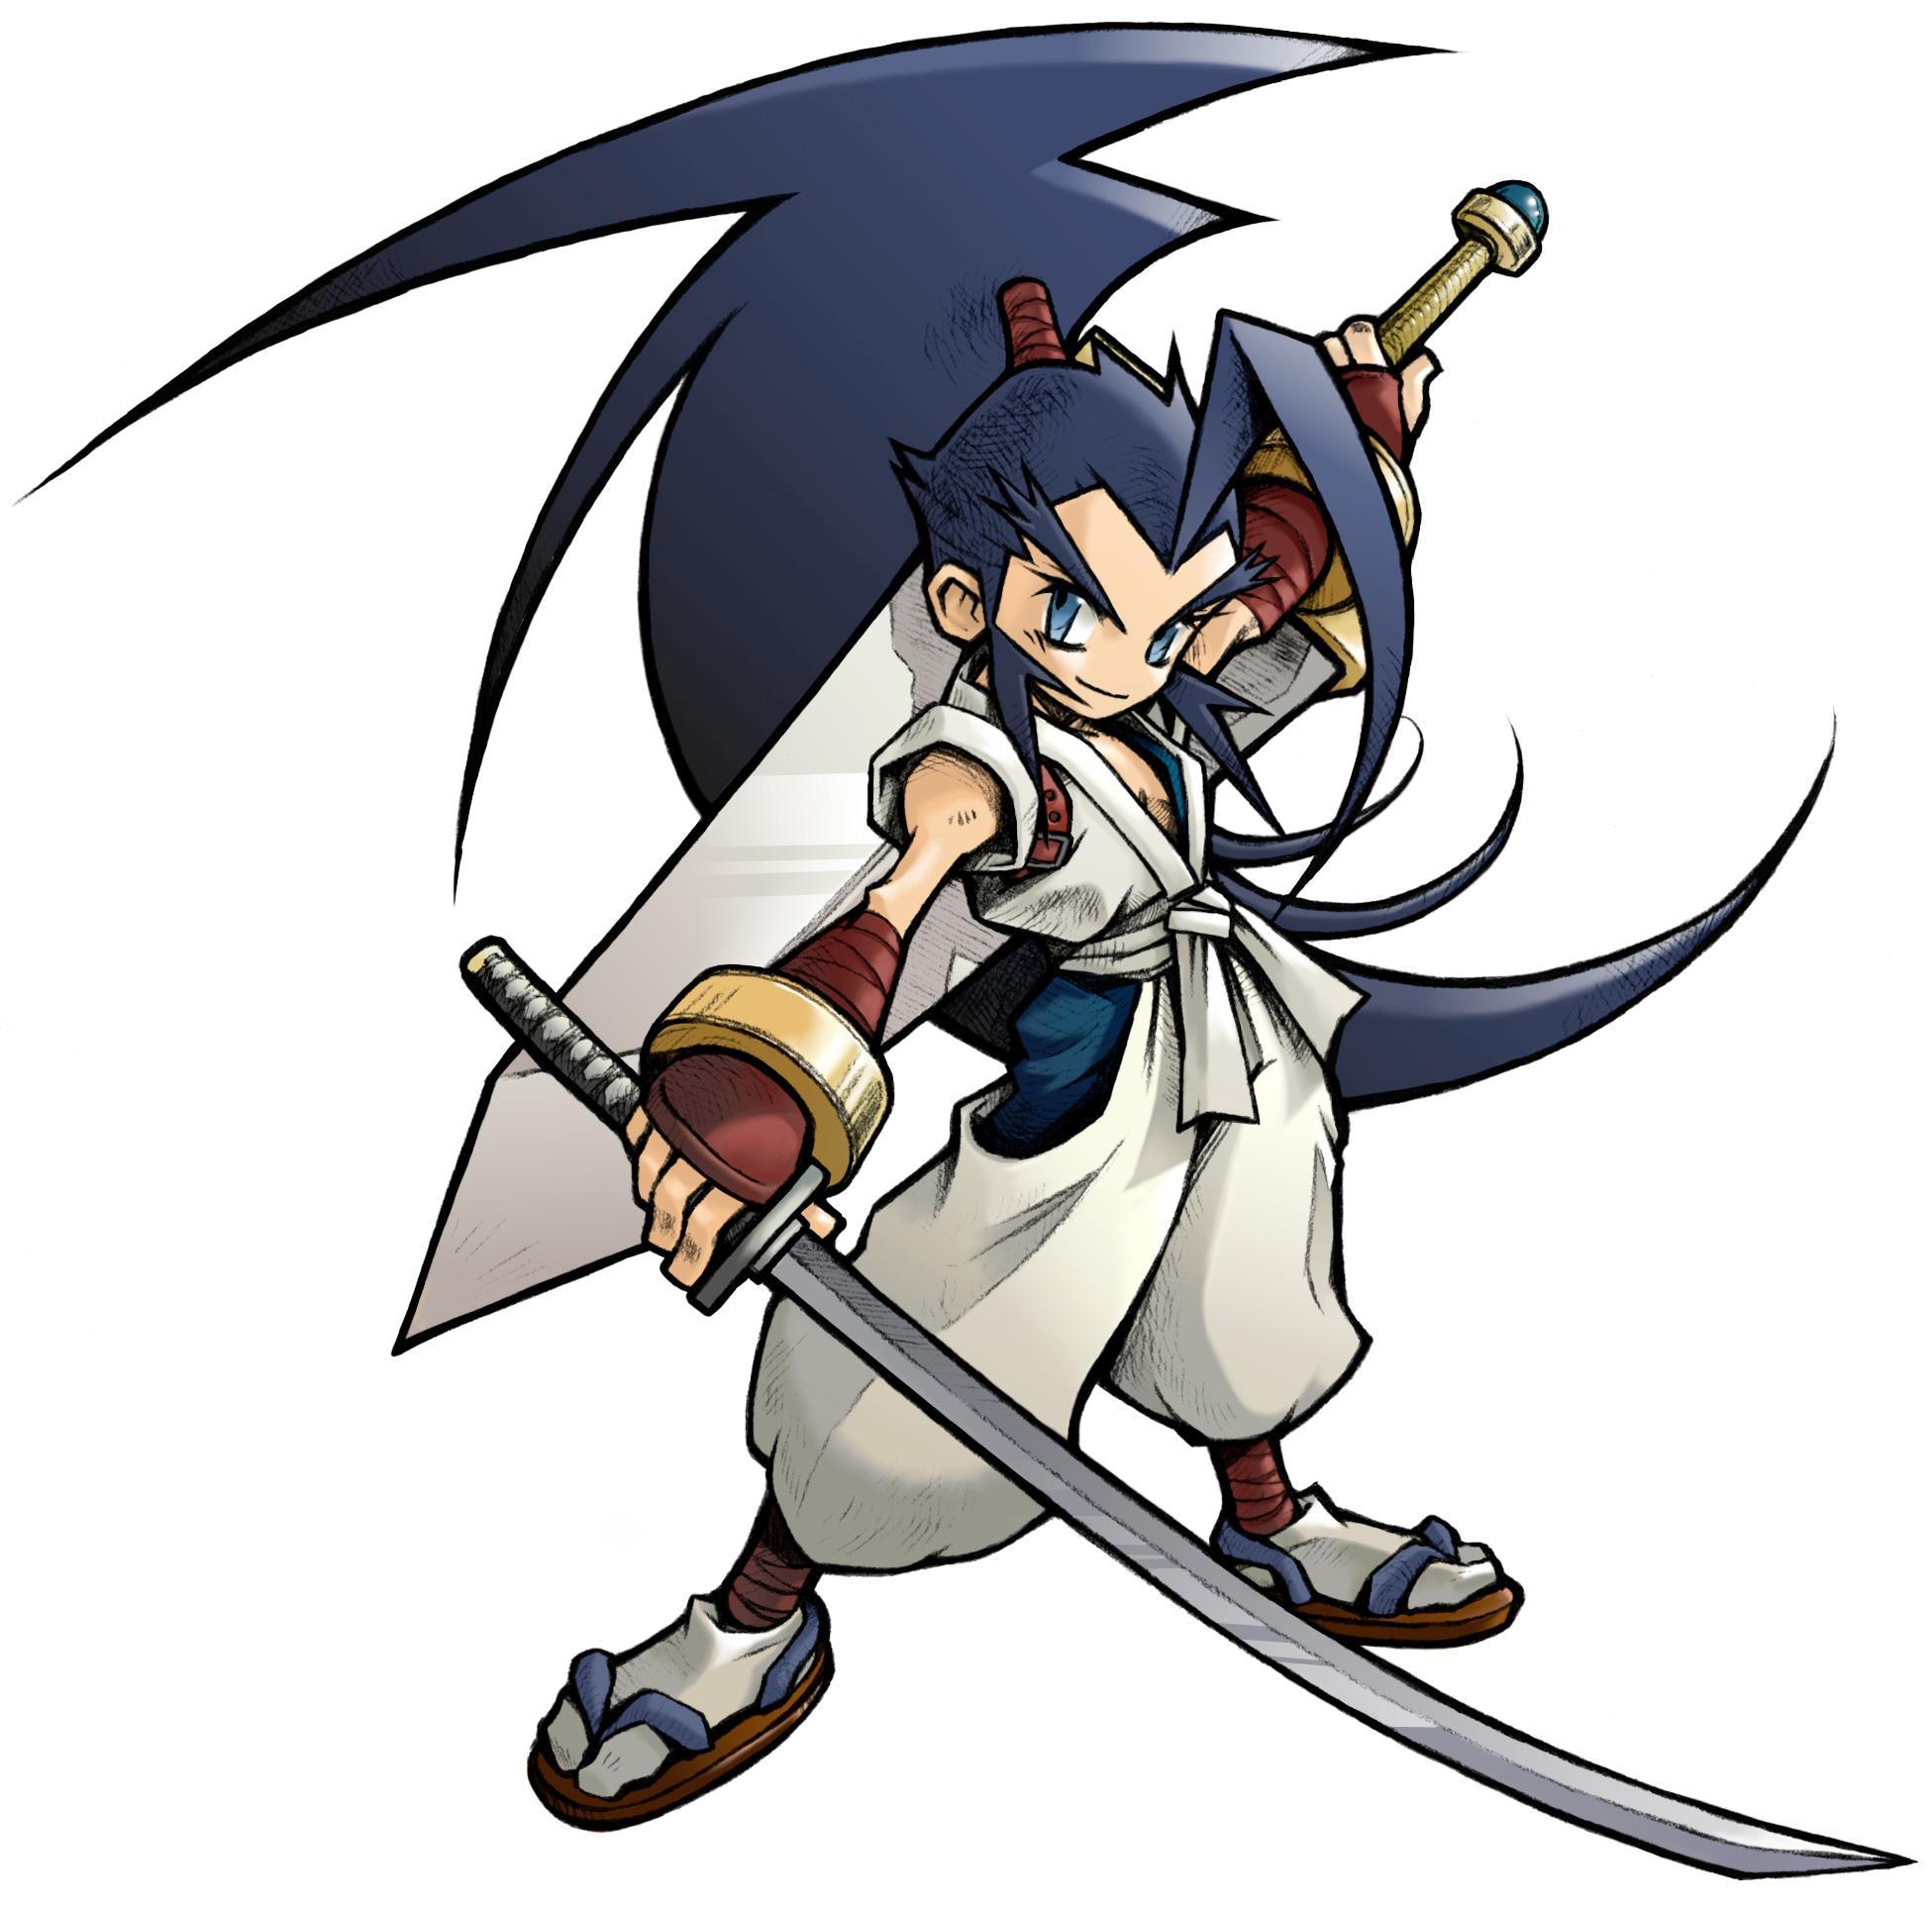 Brave Fencer Musashi (Musashi (Brave Fencer Musashi)) - Minitokyo